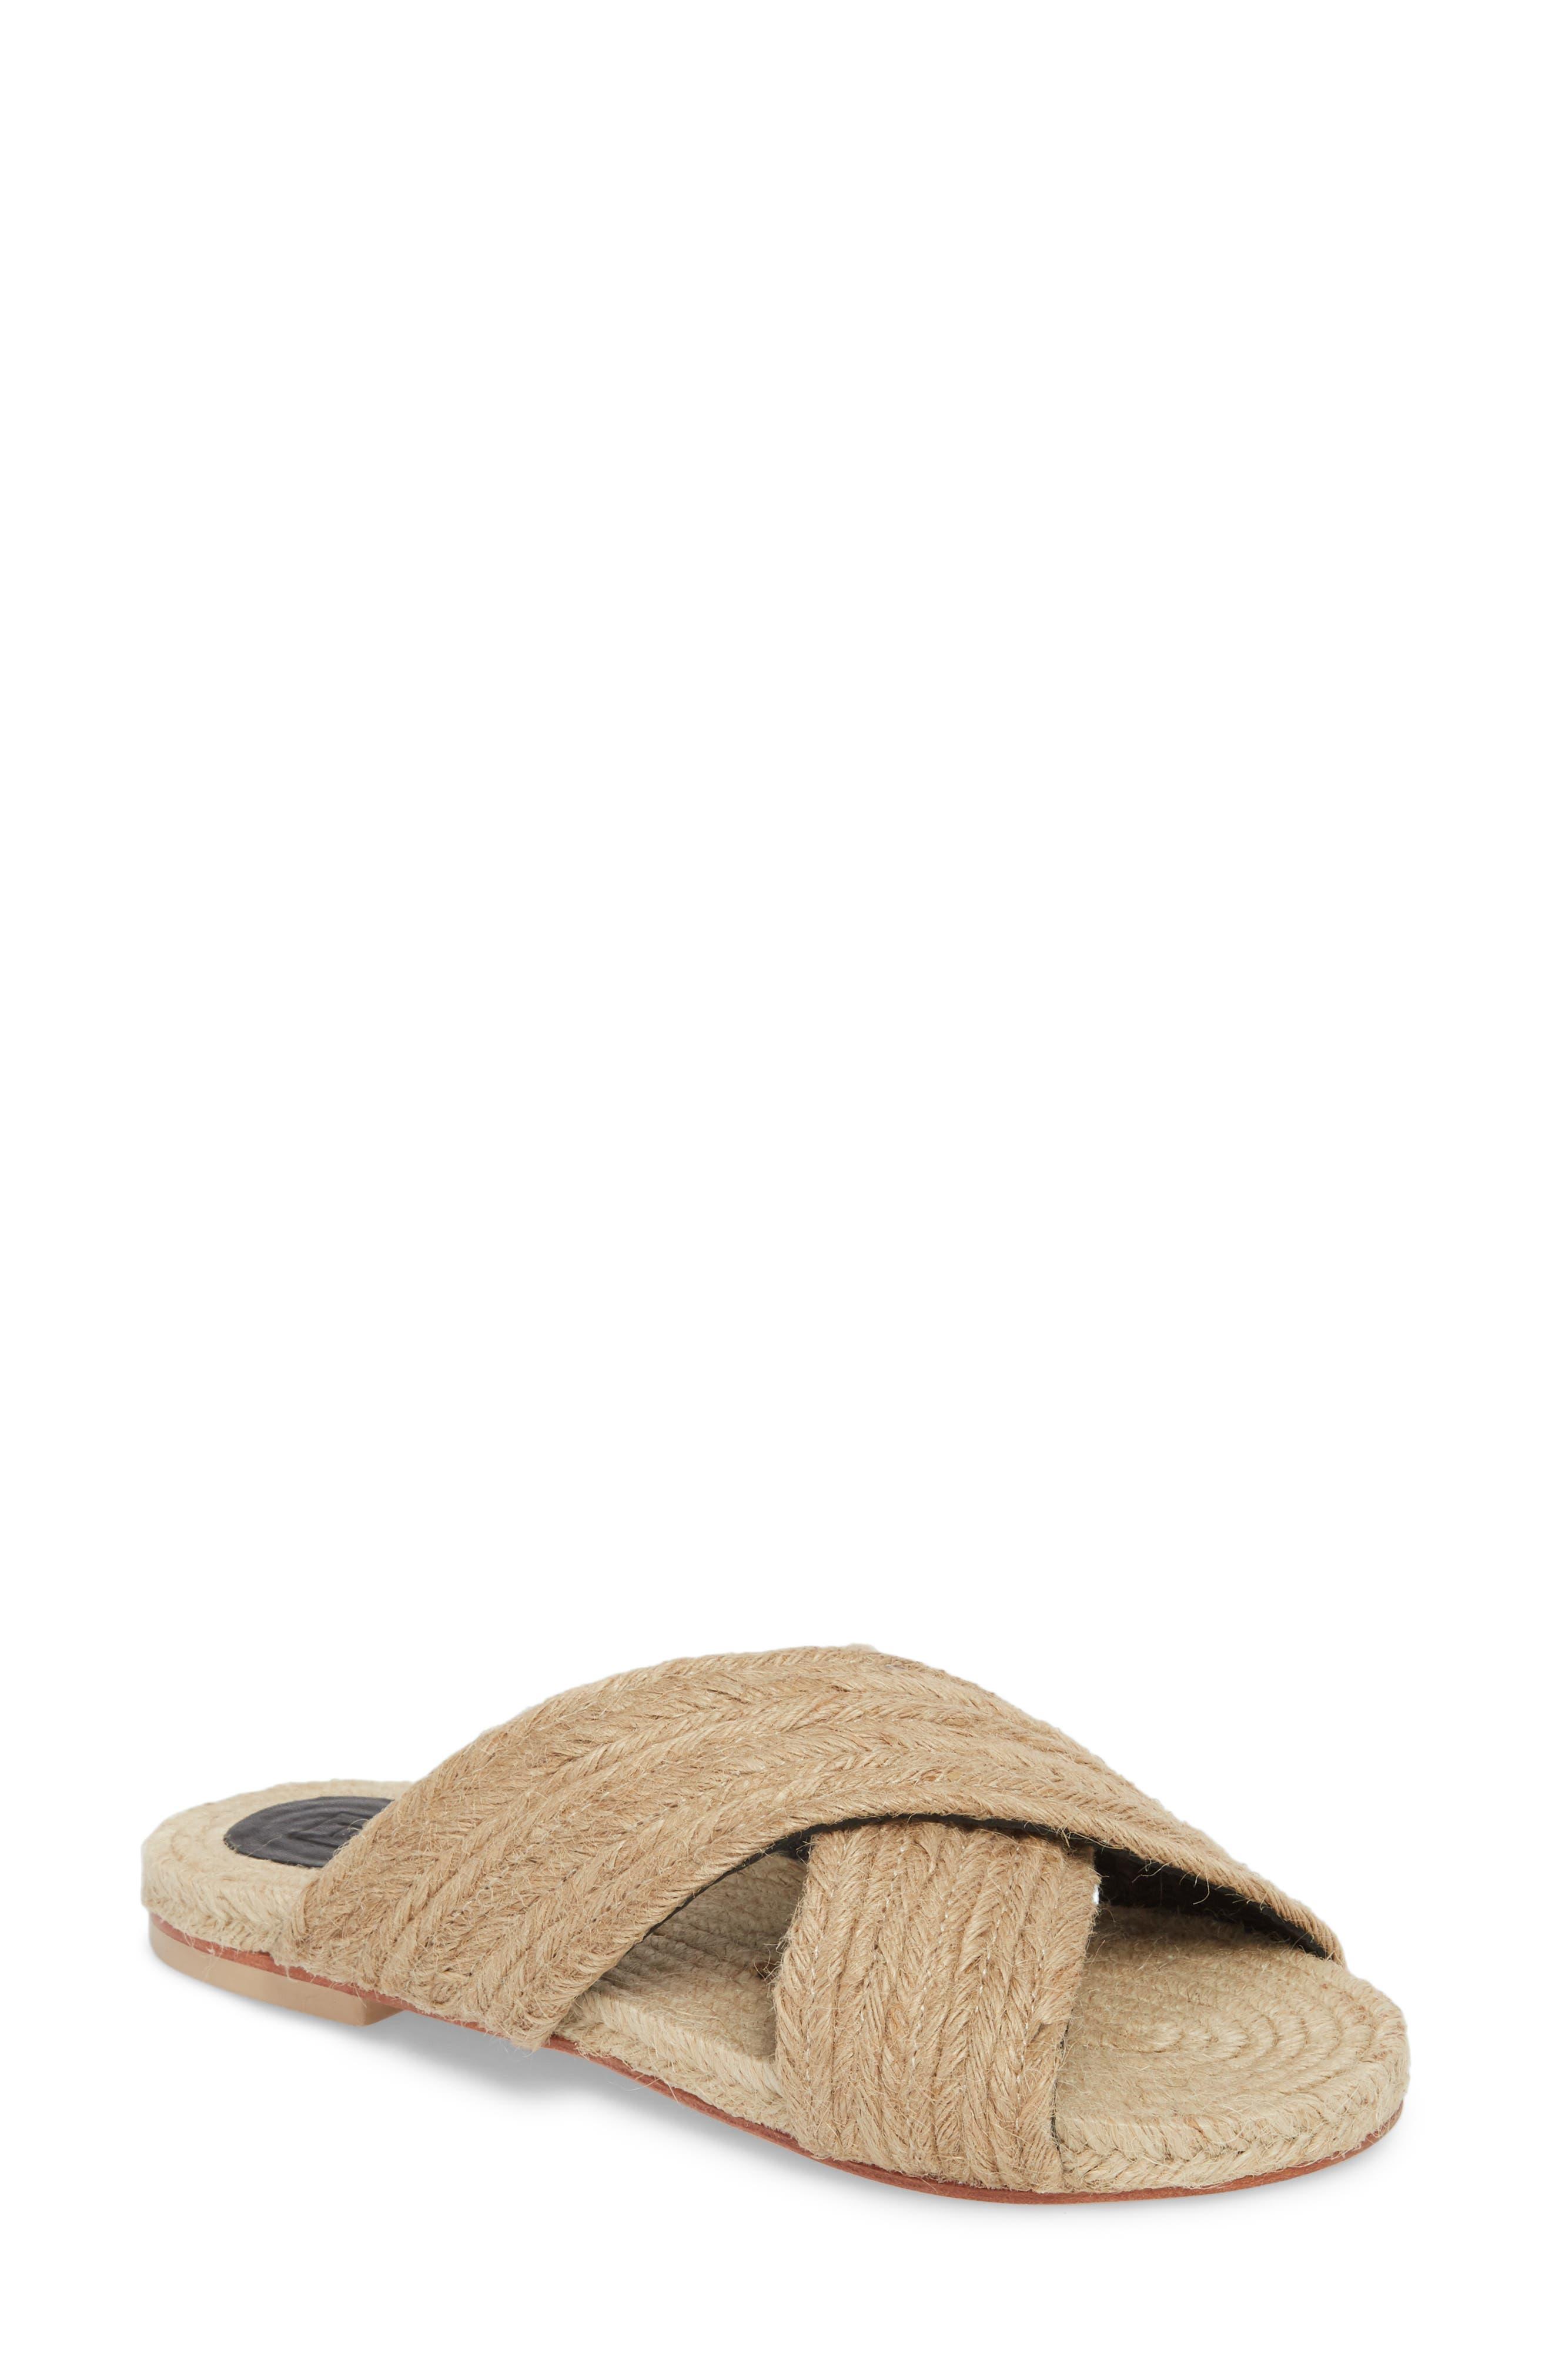 Felilx Rope Slide Sandal,                         Main,                         color, 250